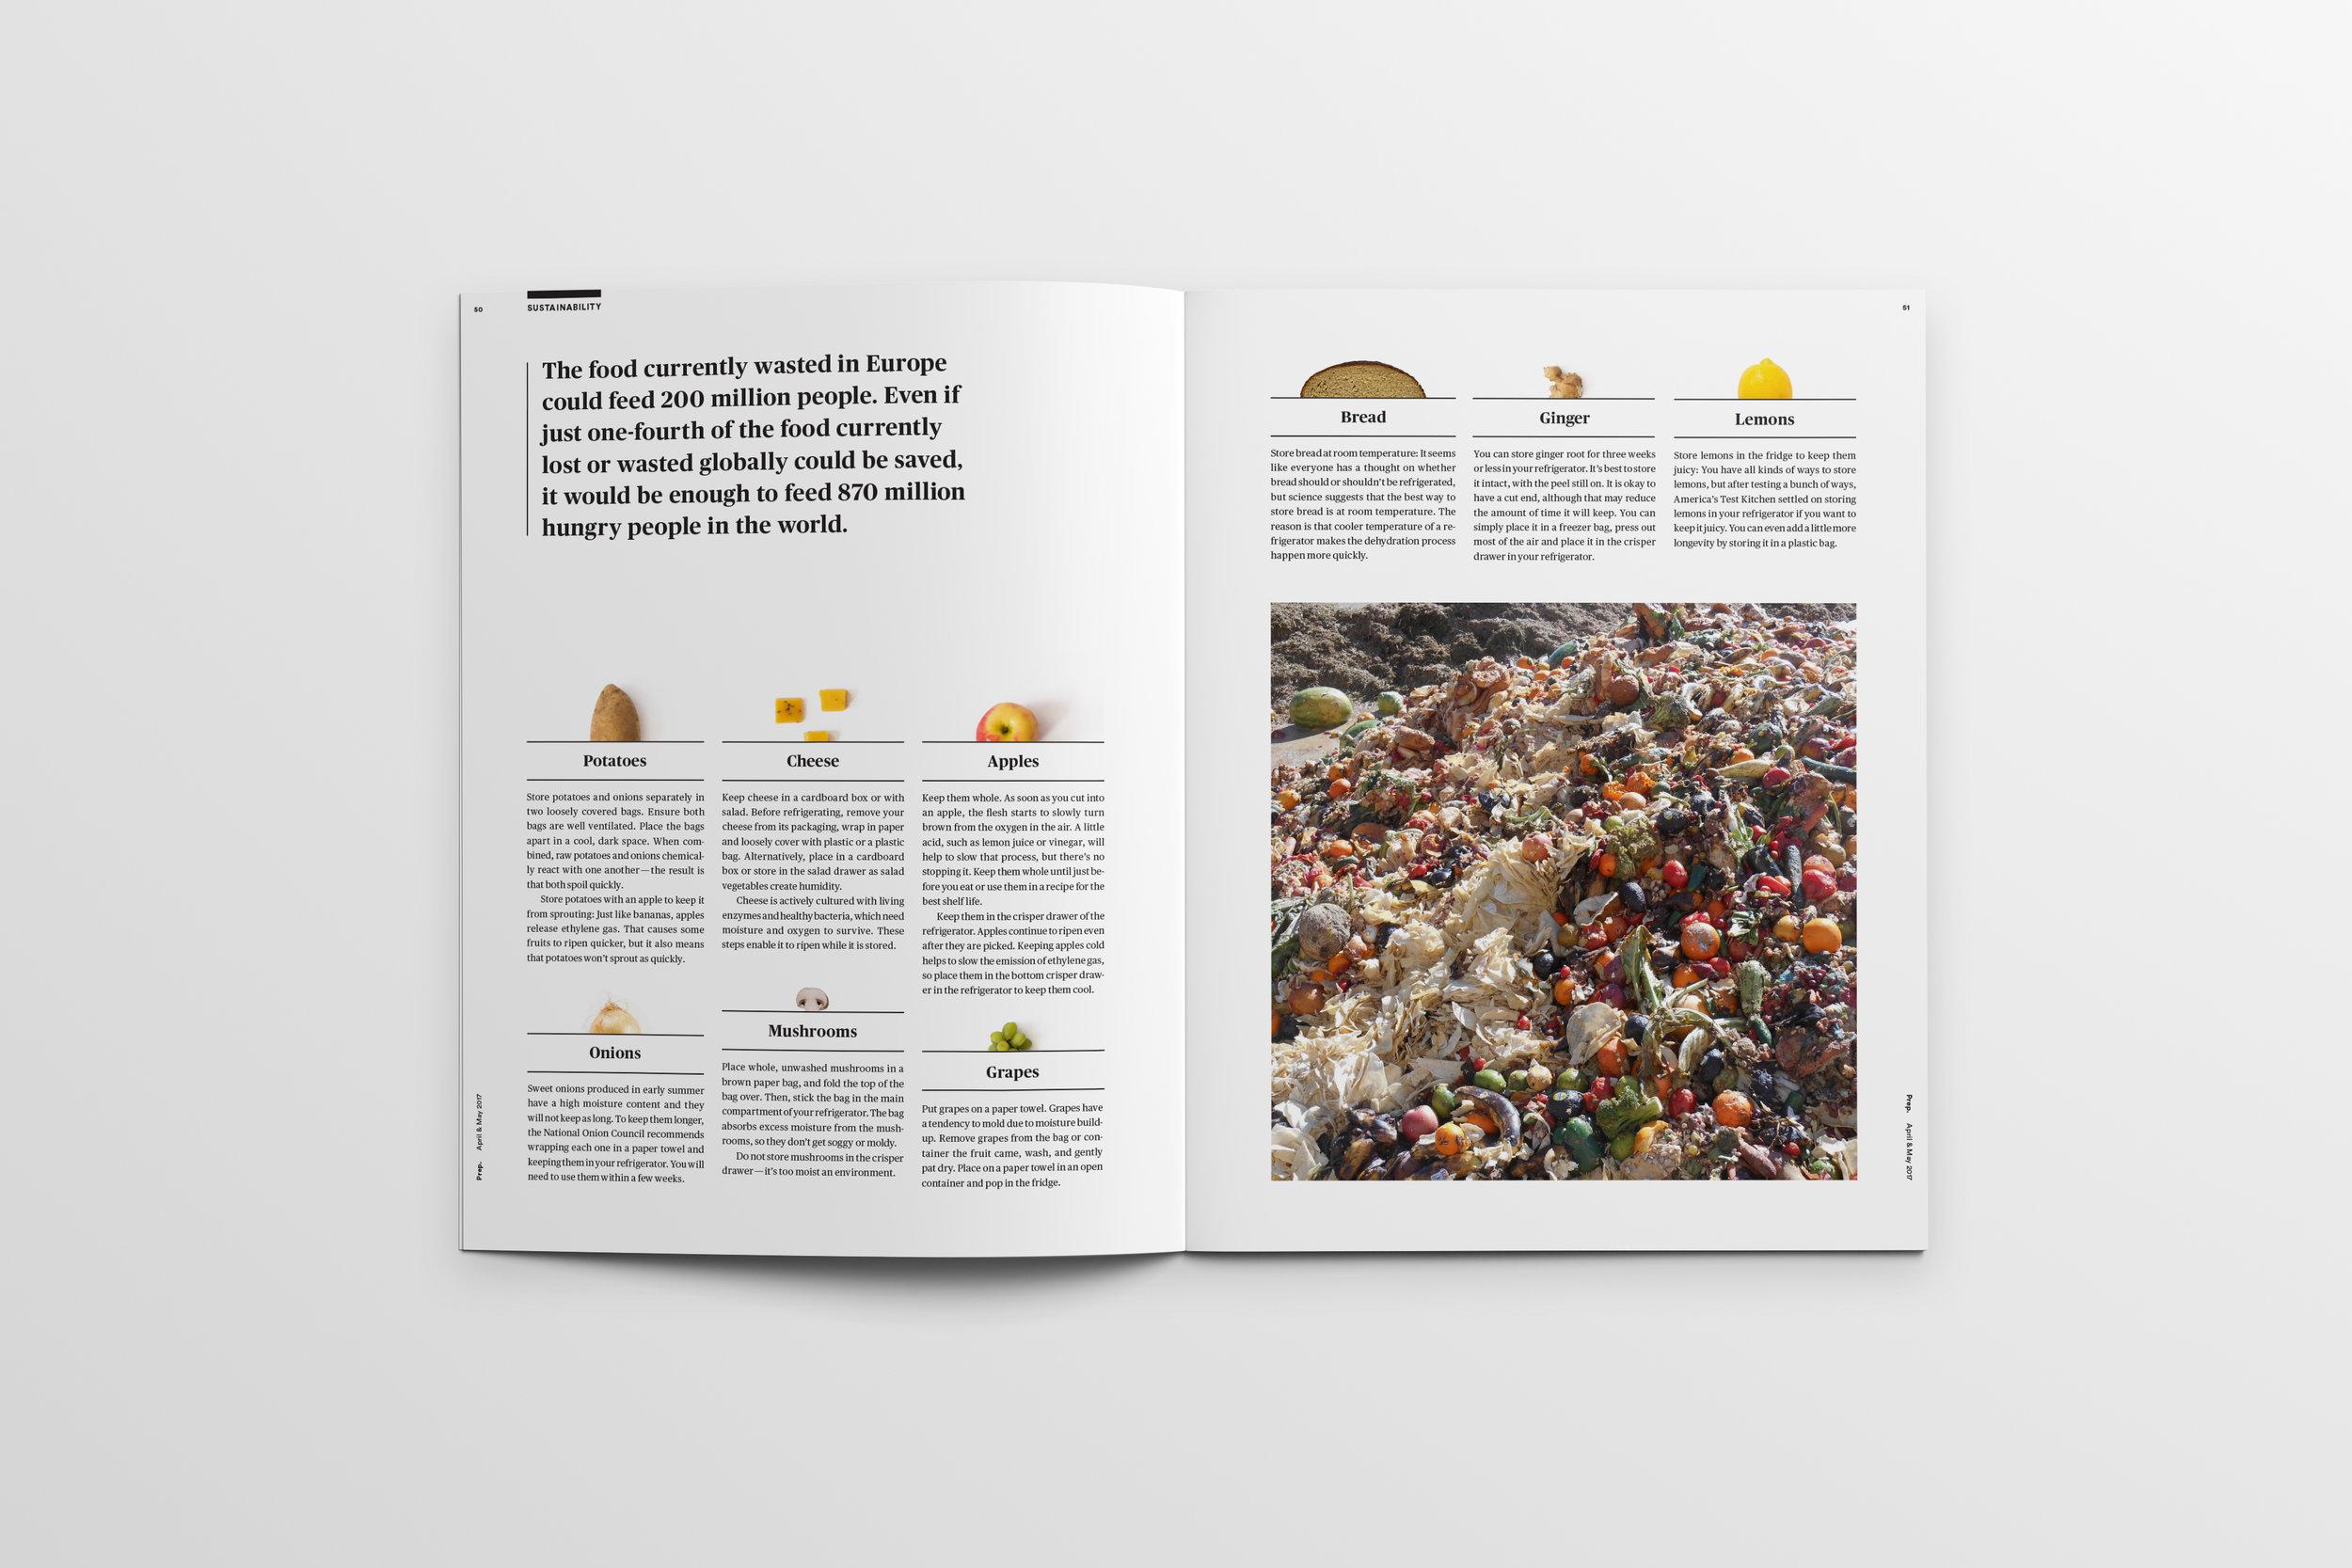 Magazine_Mockup_Pages50-51.jpg